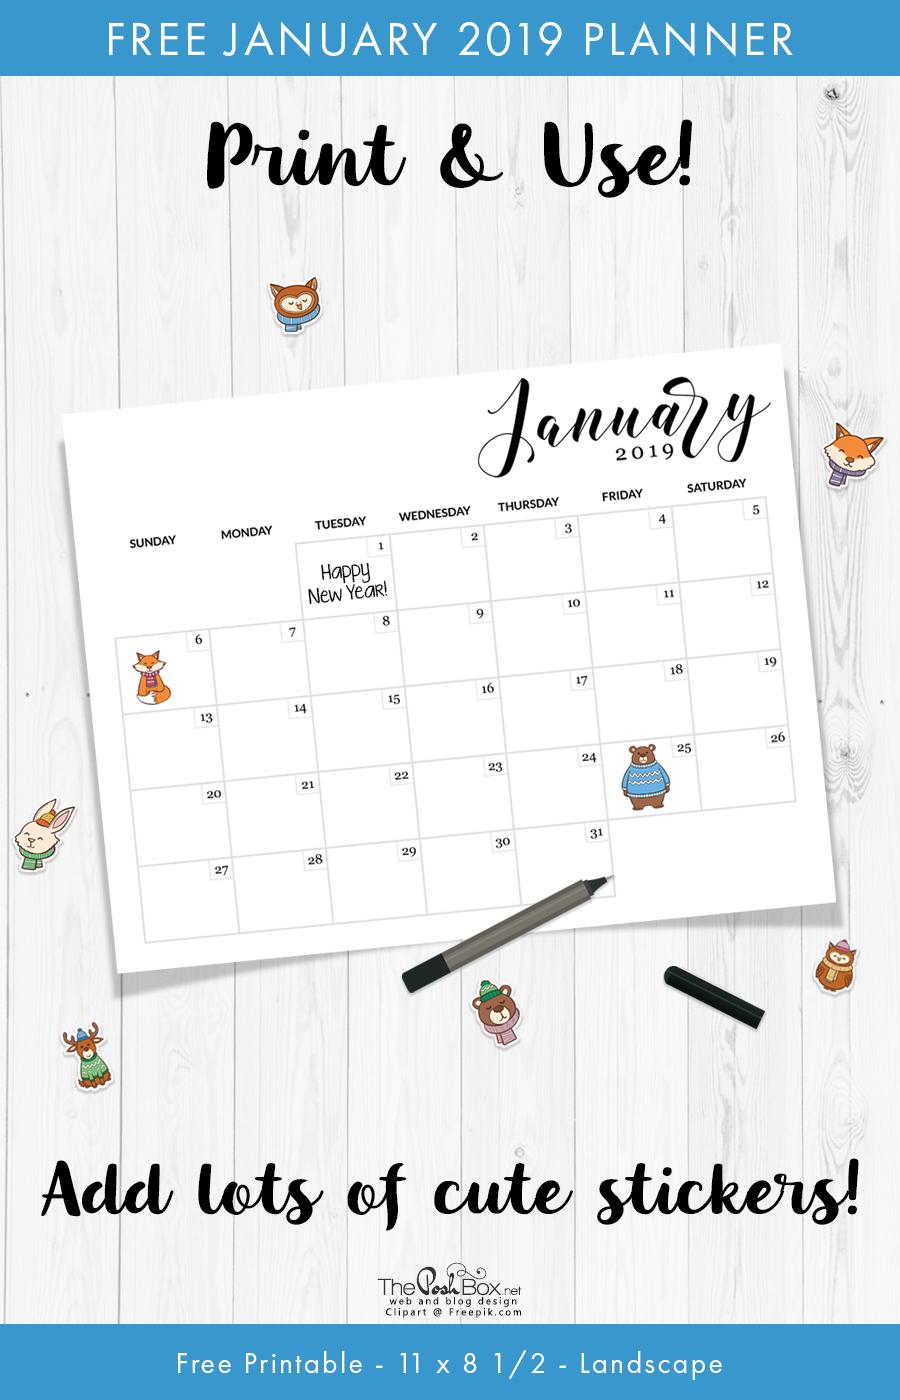 Free Printable January Calendar & Planner   The Posh Box Calendar 2019 Officemax